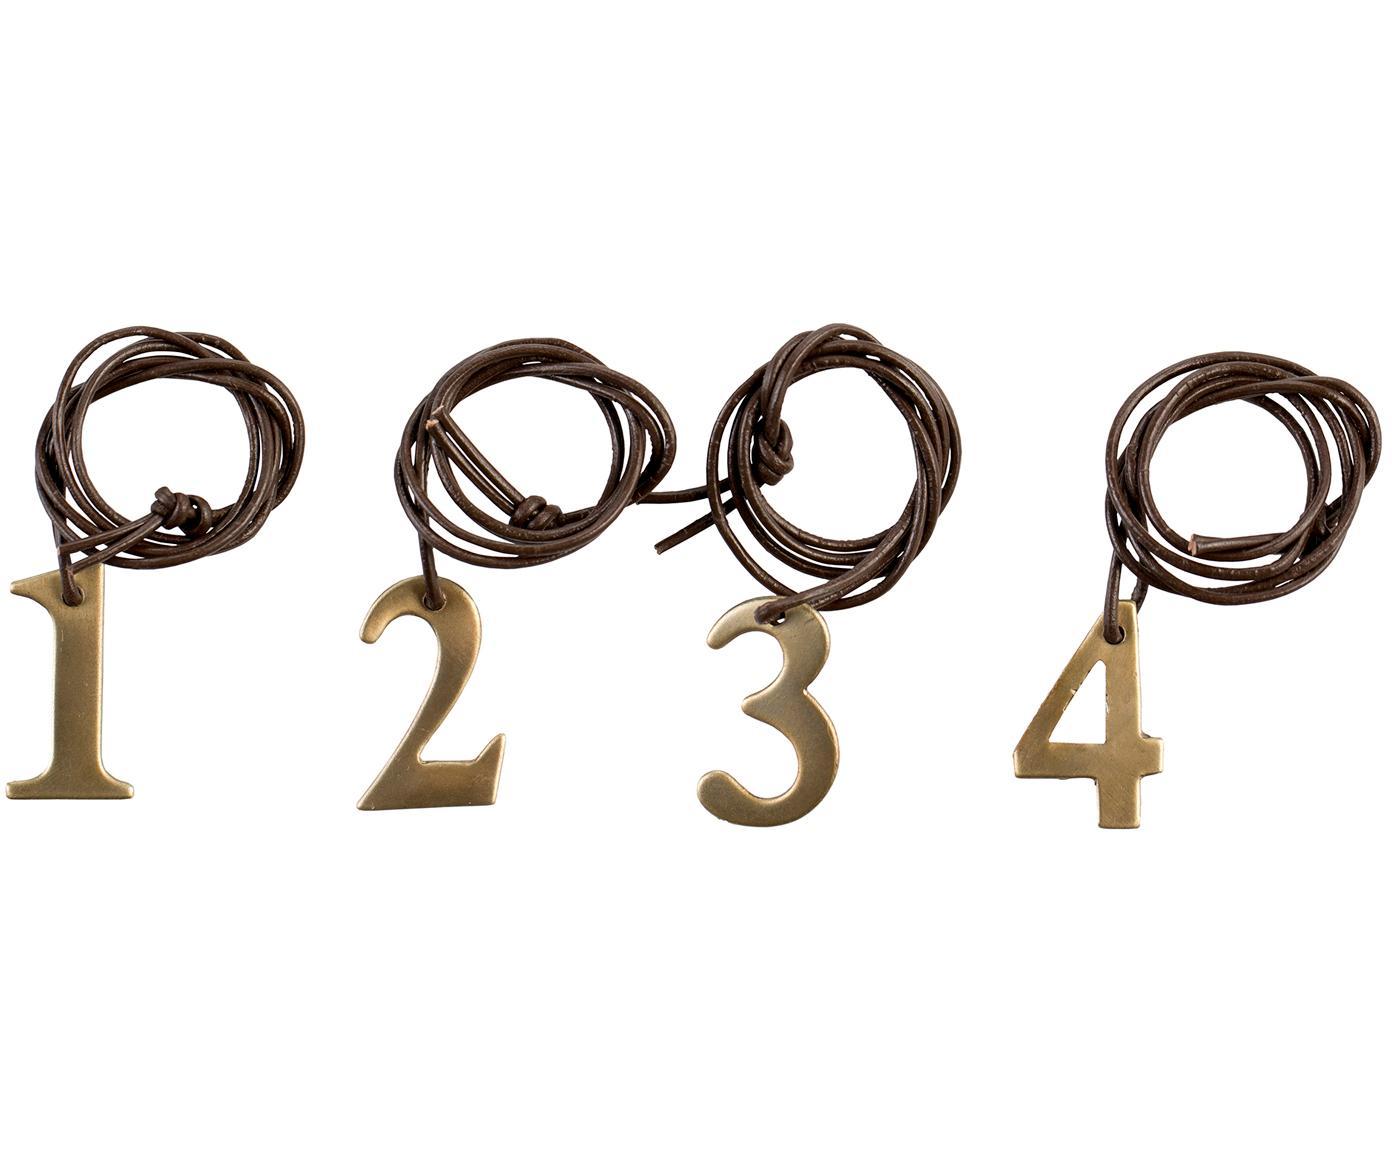 Set de colgantes decorativos Dana Advent Number, 4pzas., Cordón: cuero, Latón, marrón, An 2 x Al 3 cm